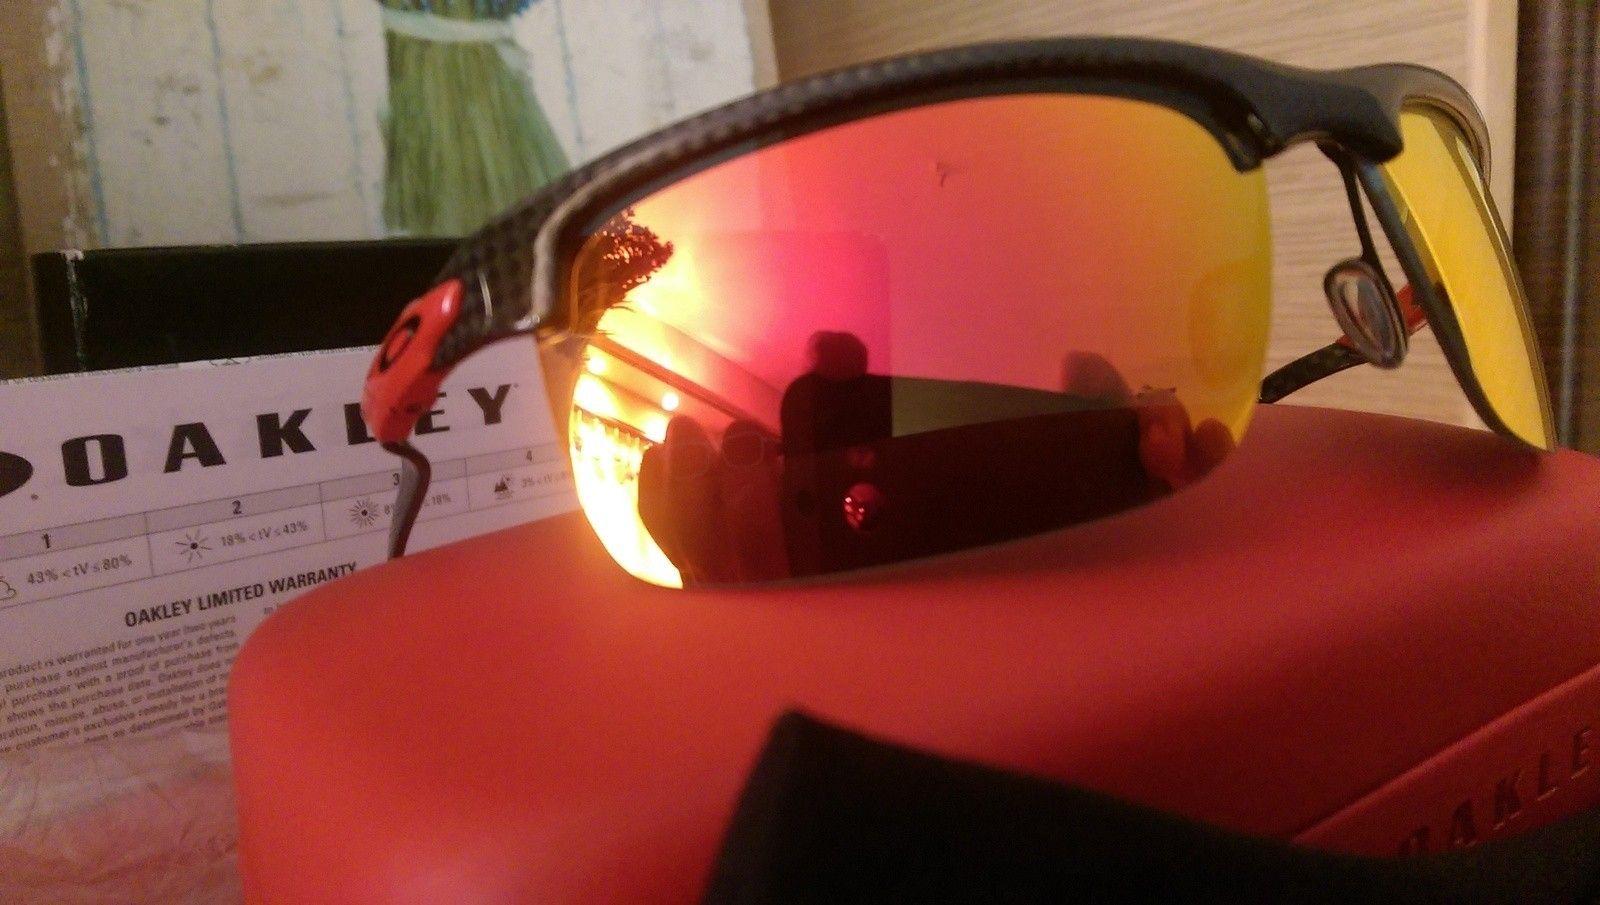 Oakley Scuderia Ferrari Carbon Blade ***Price Drop*** - uploadfromtaptalk1452608221001.jpg